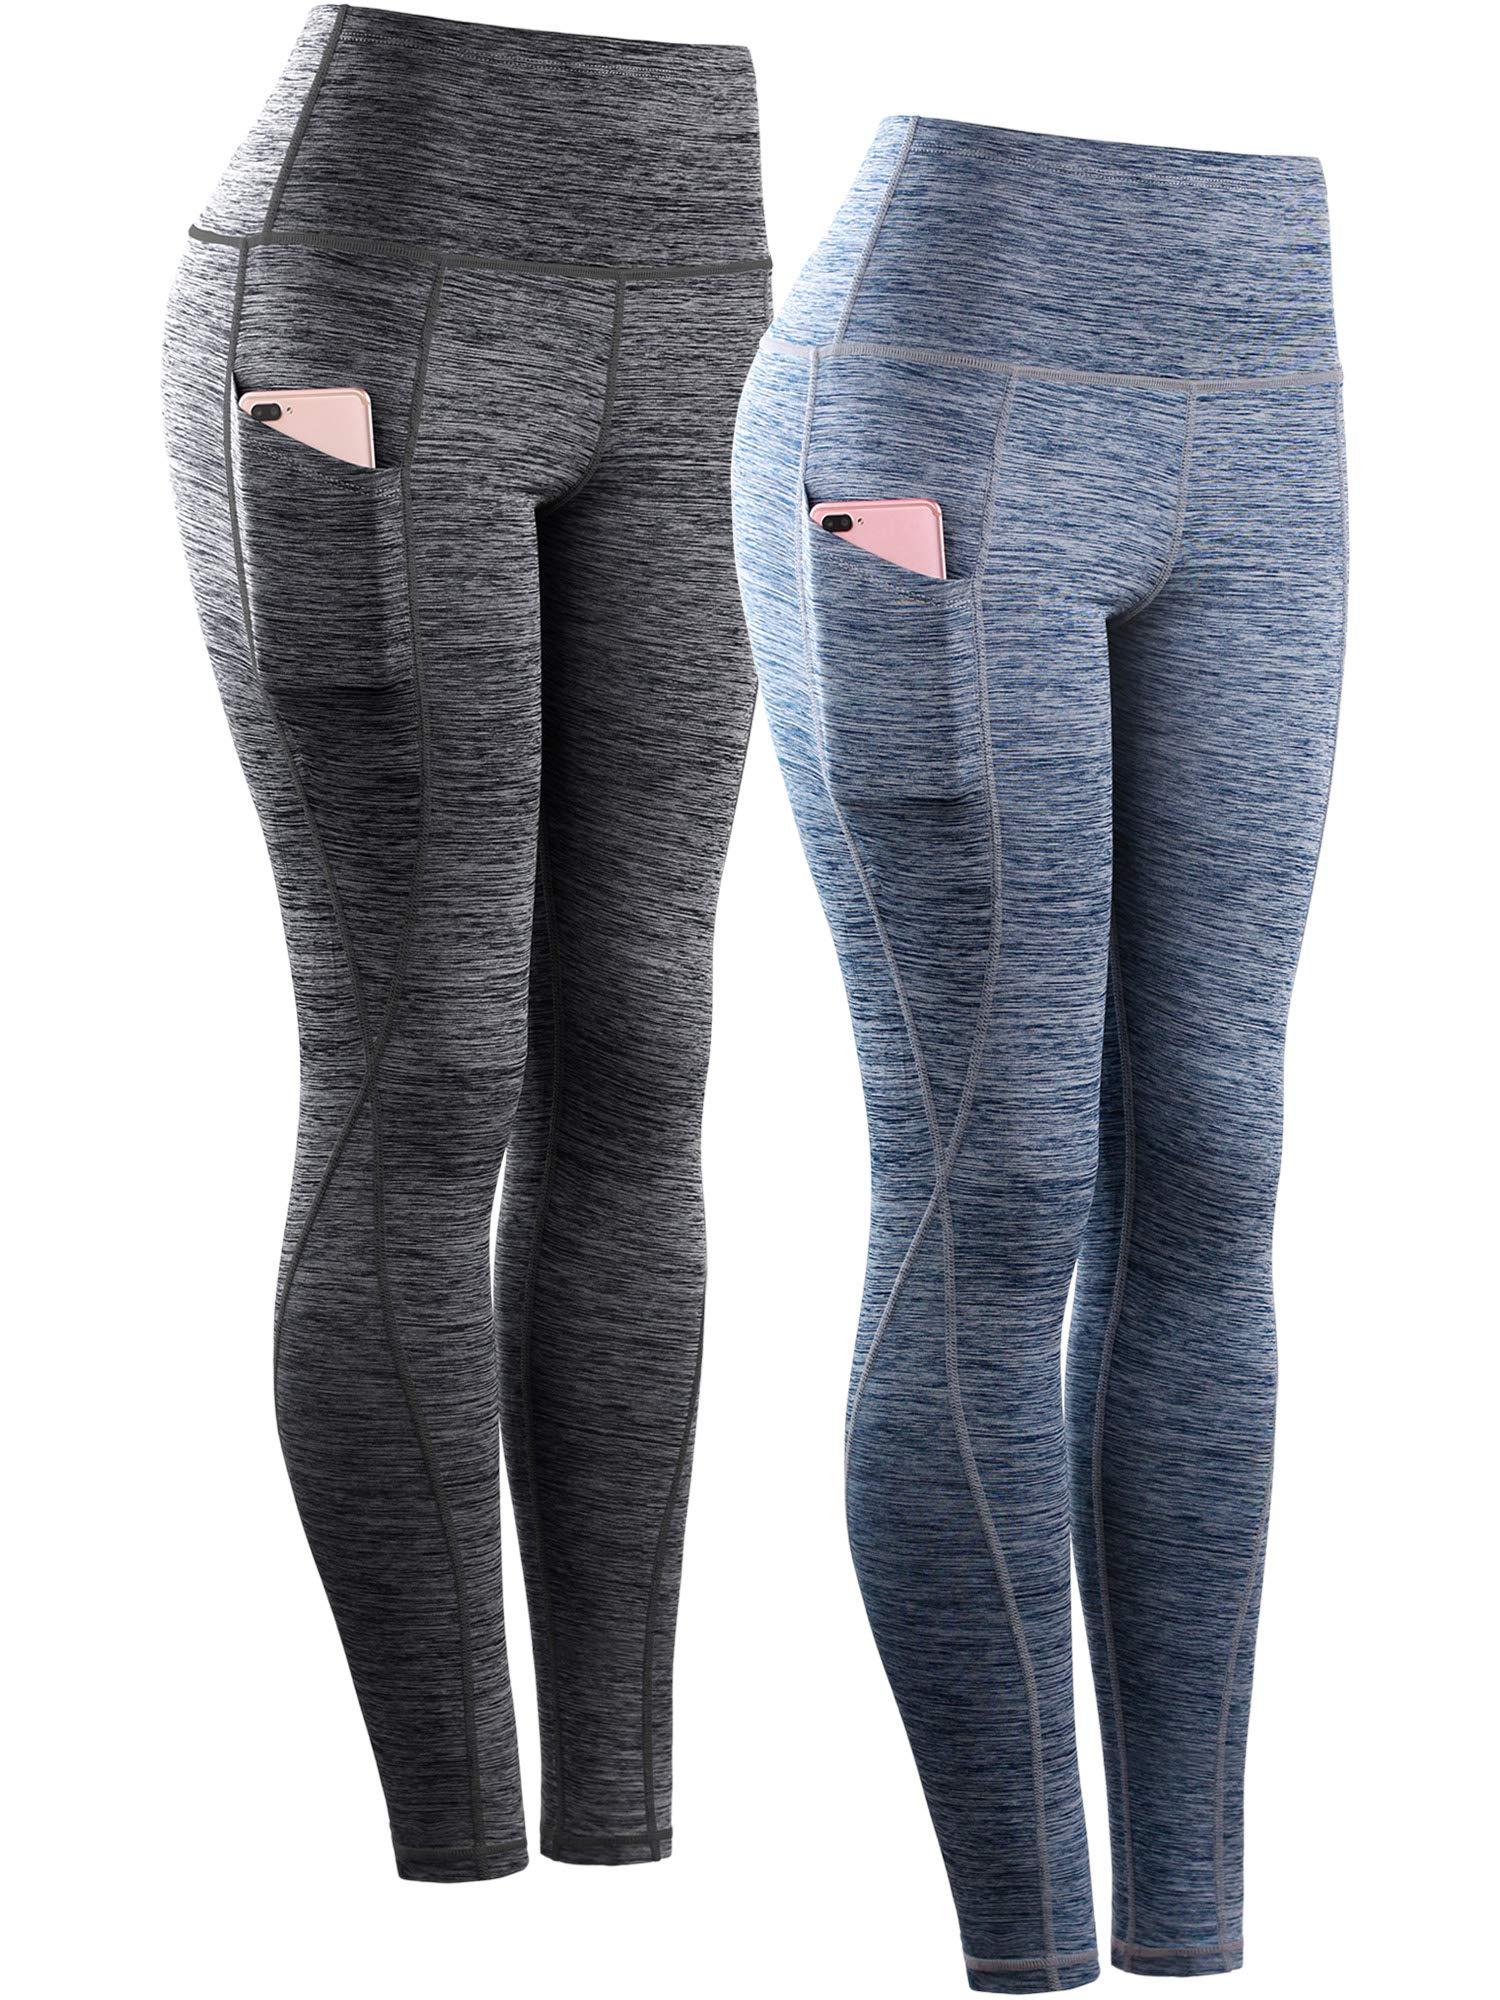 Neleus Tummy Control High Waist Workout Running Leggings for Women,9033,Yoga Pant 2 Pack,Black,Navy Blue,S,EU M